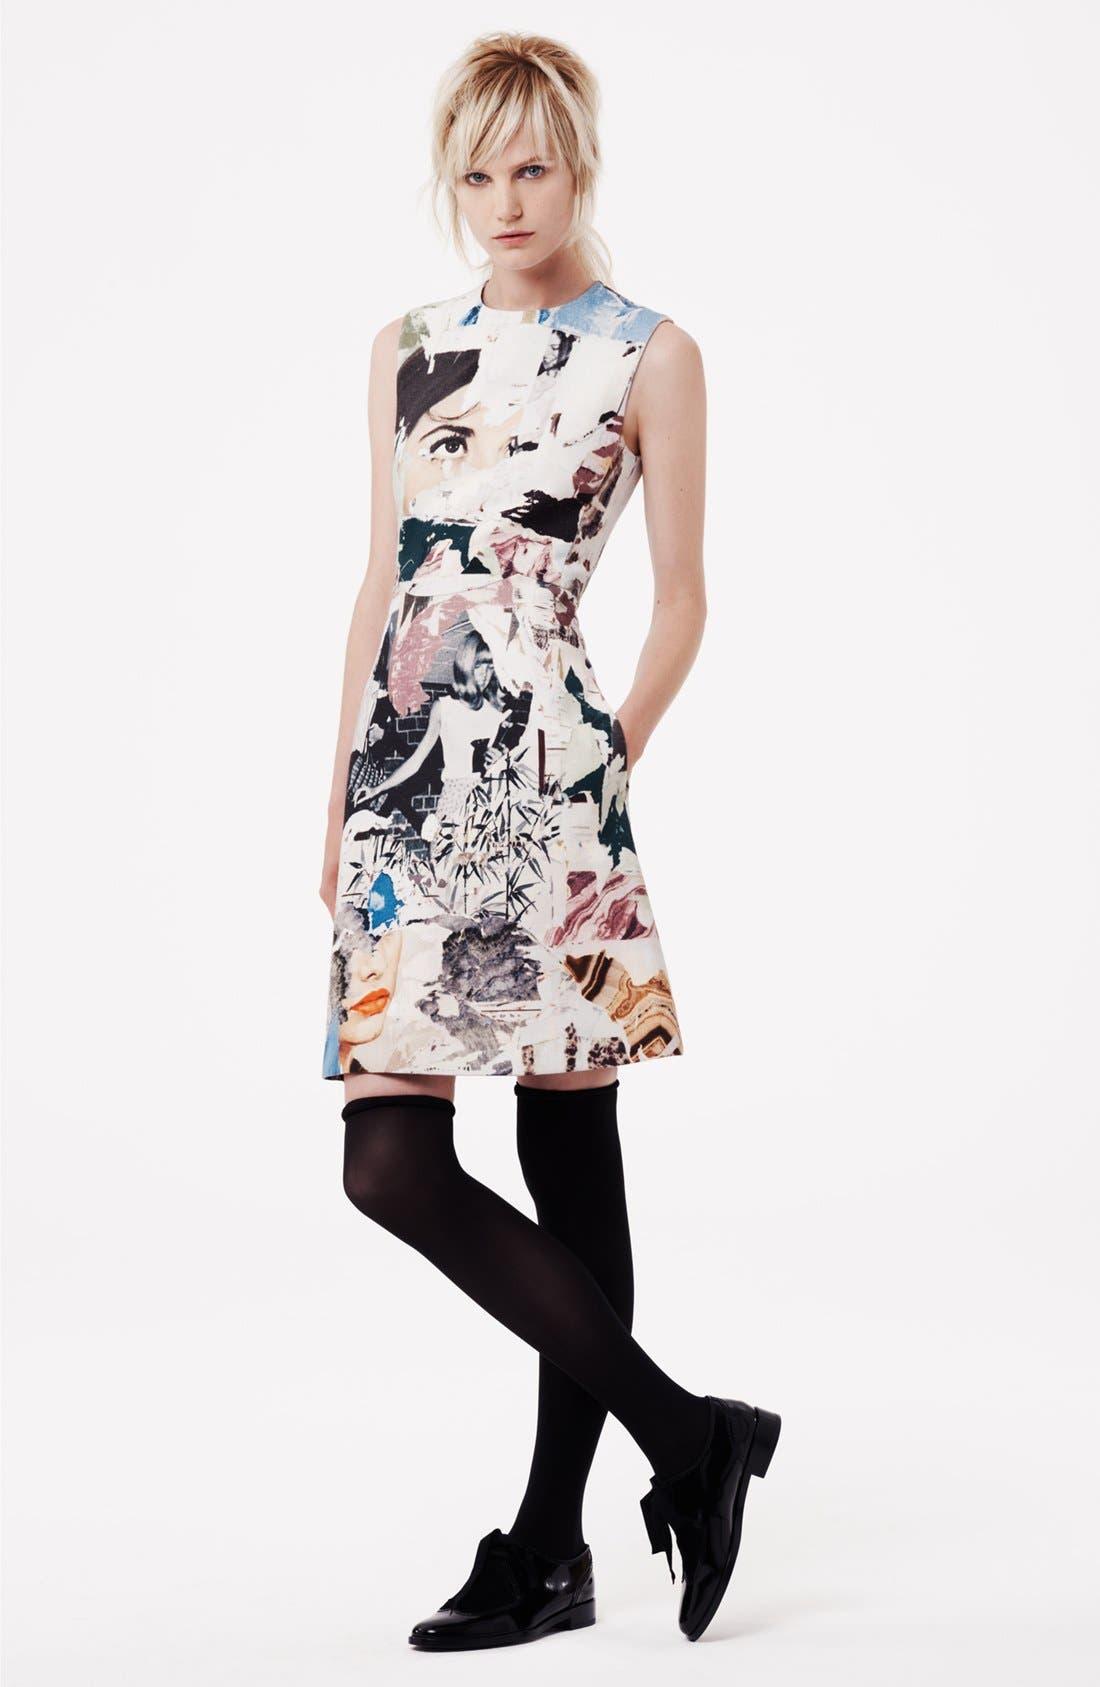 Main Image - Carven Dress & Accessories